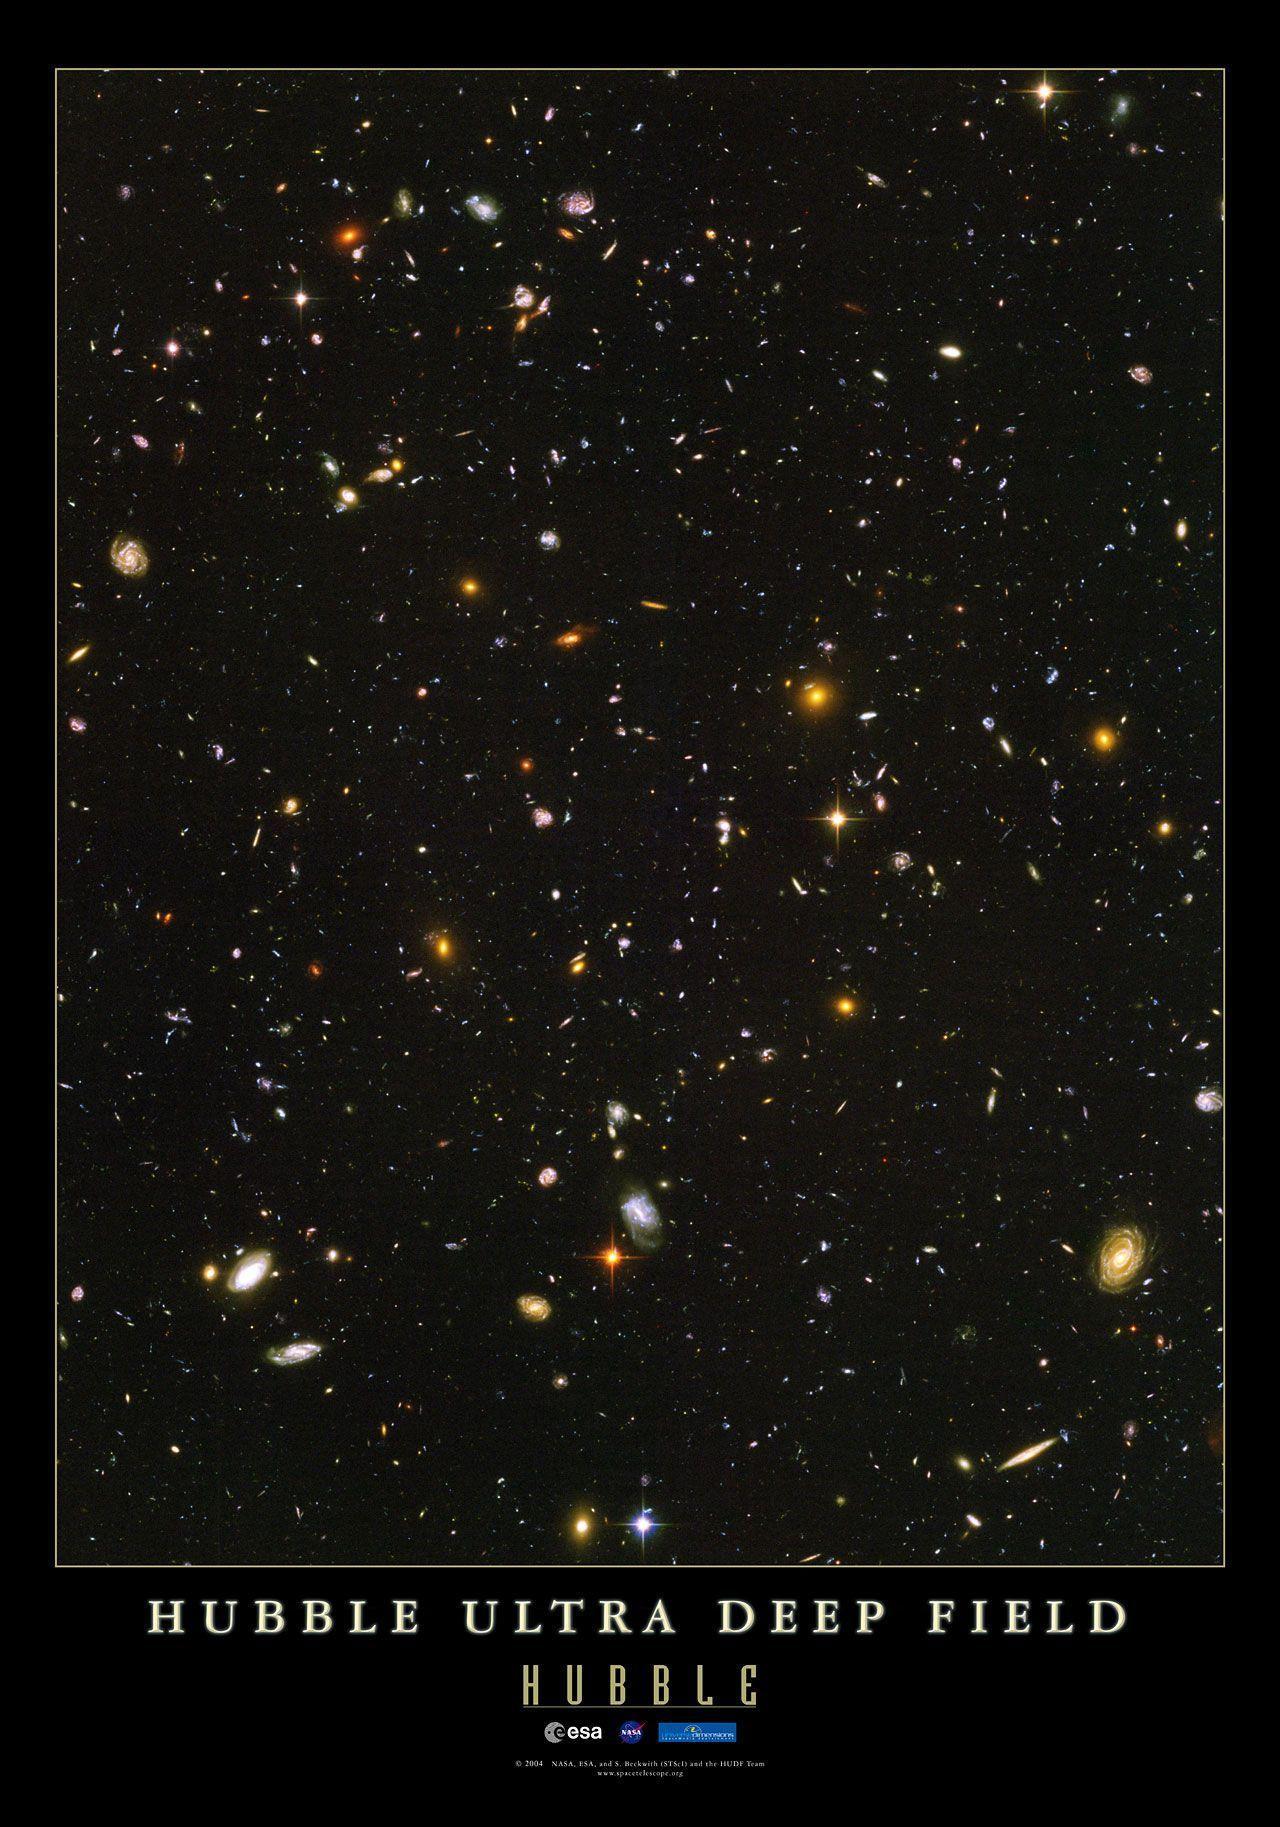 hubble ultra deep field 1366x768 - photo #6